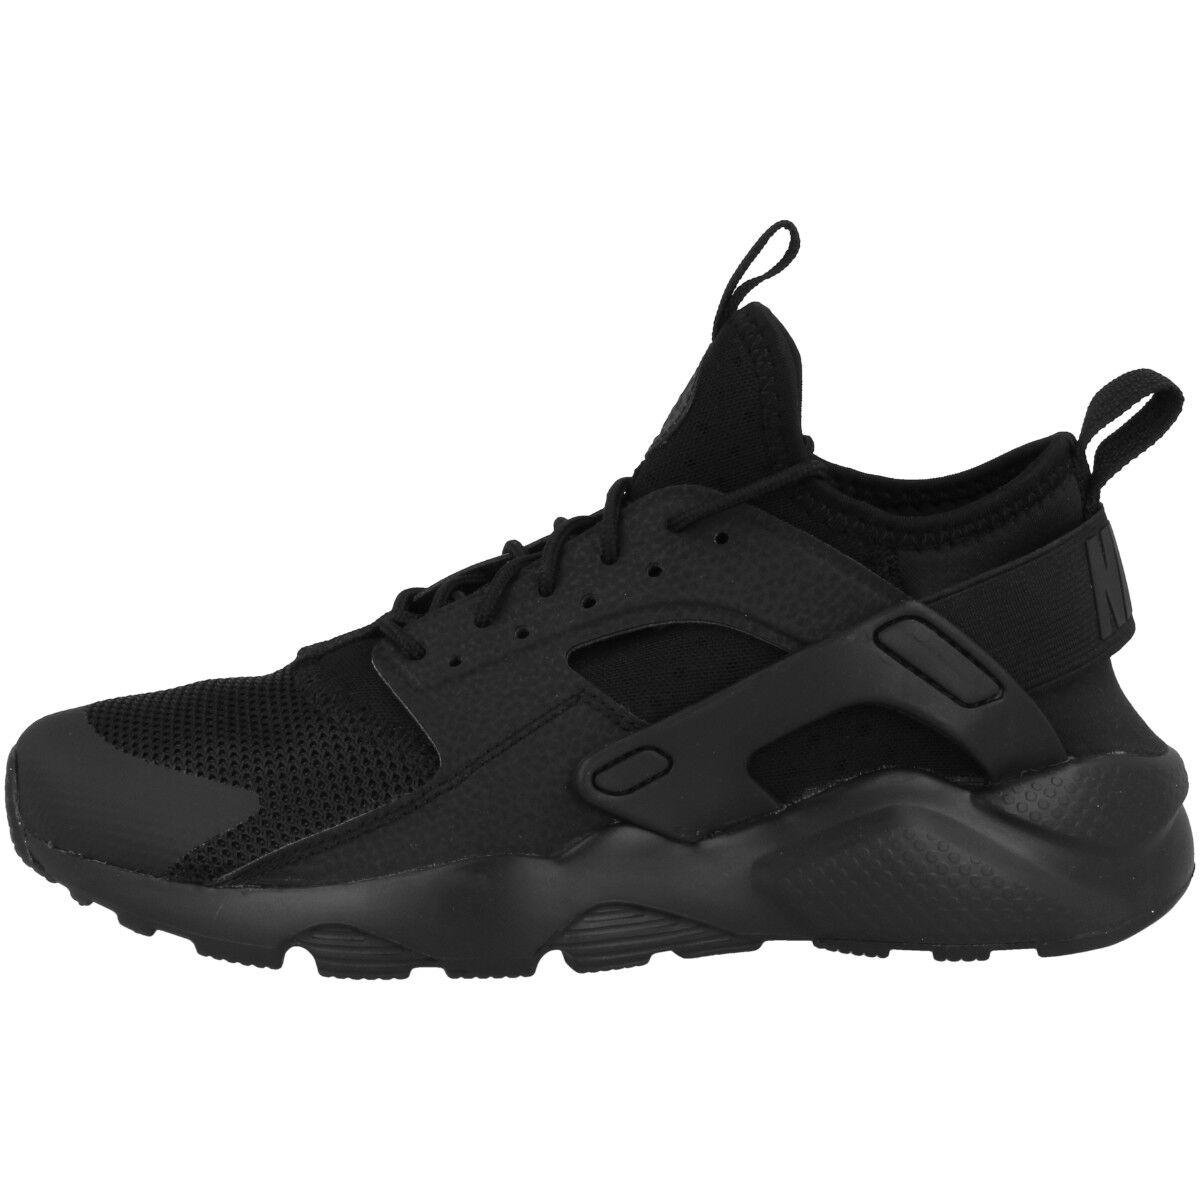 Nike Air Huarache Run Ultra GS Schuhe Freizeit Turnschuhe Turnschuhe Turnschuhe Turnschuhe 847569    278a14